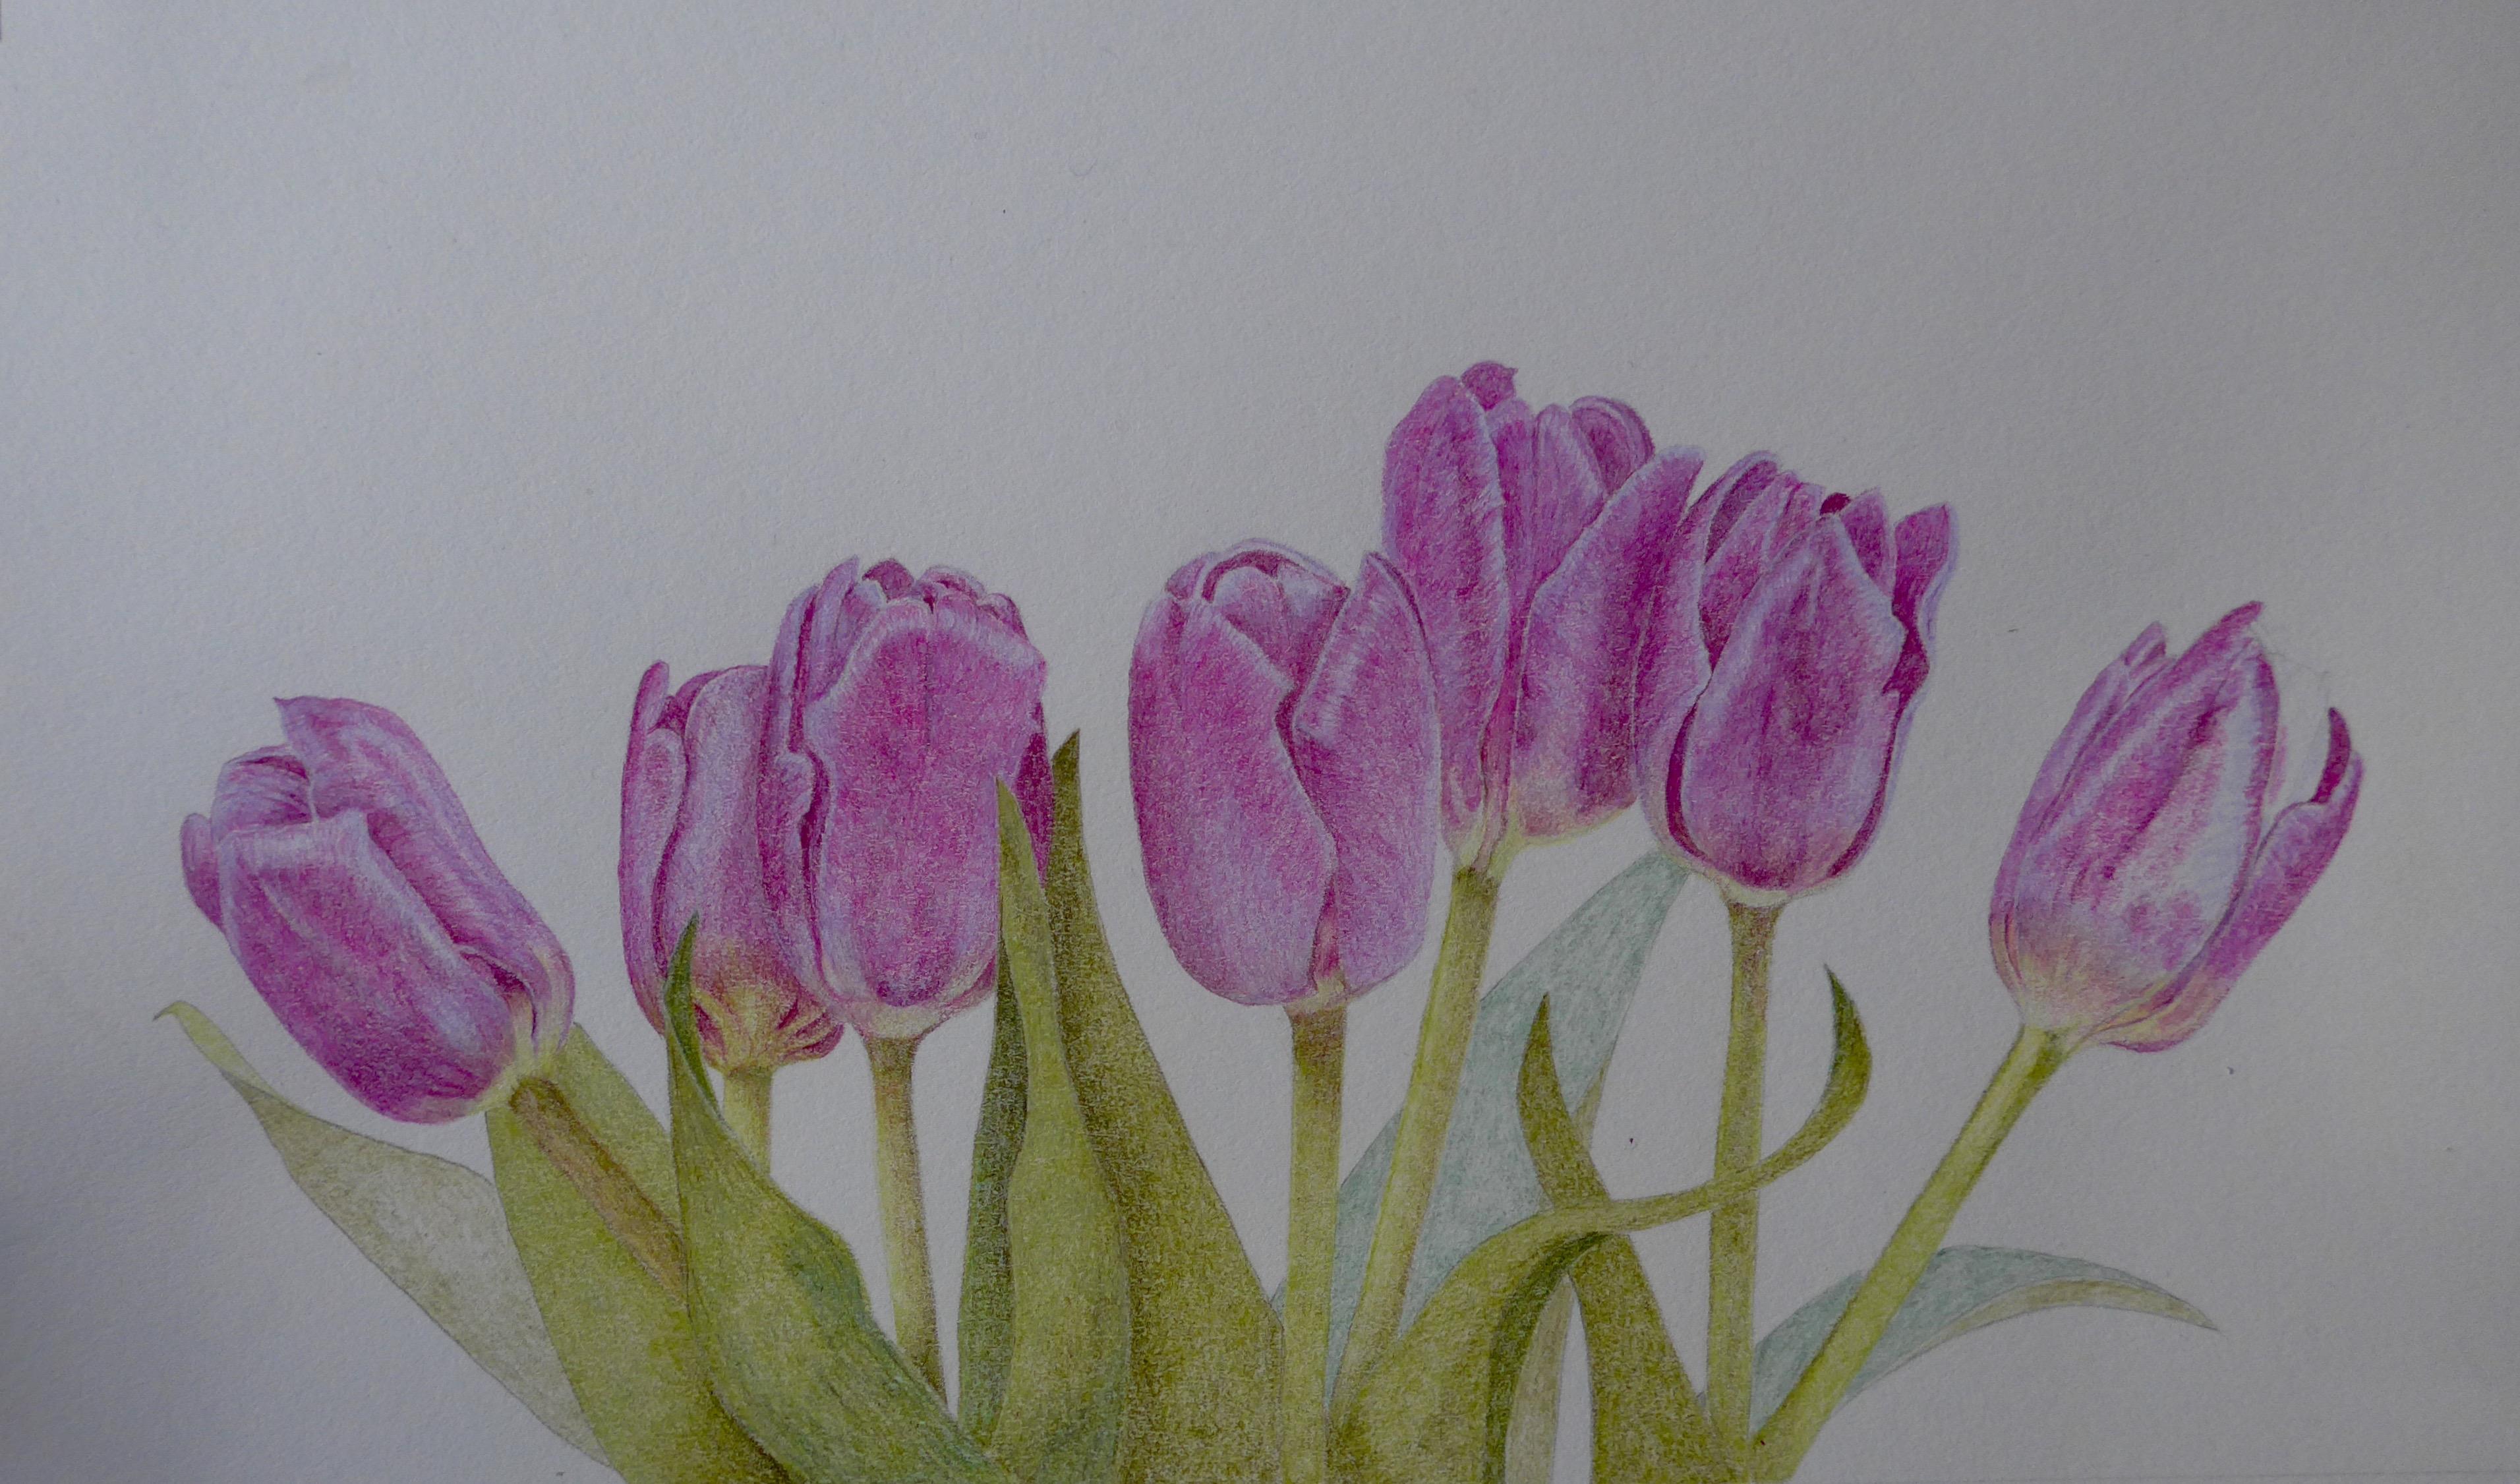 Nearly finished tulips